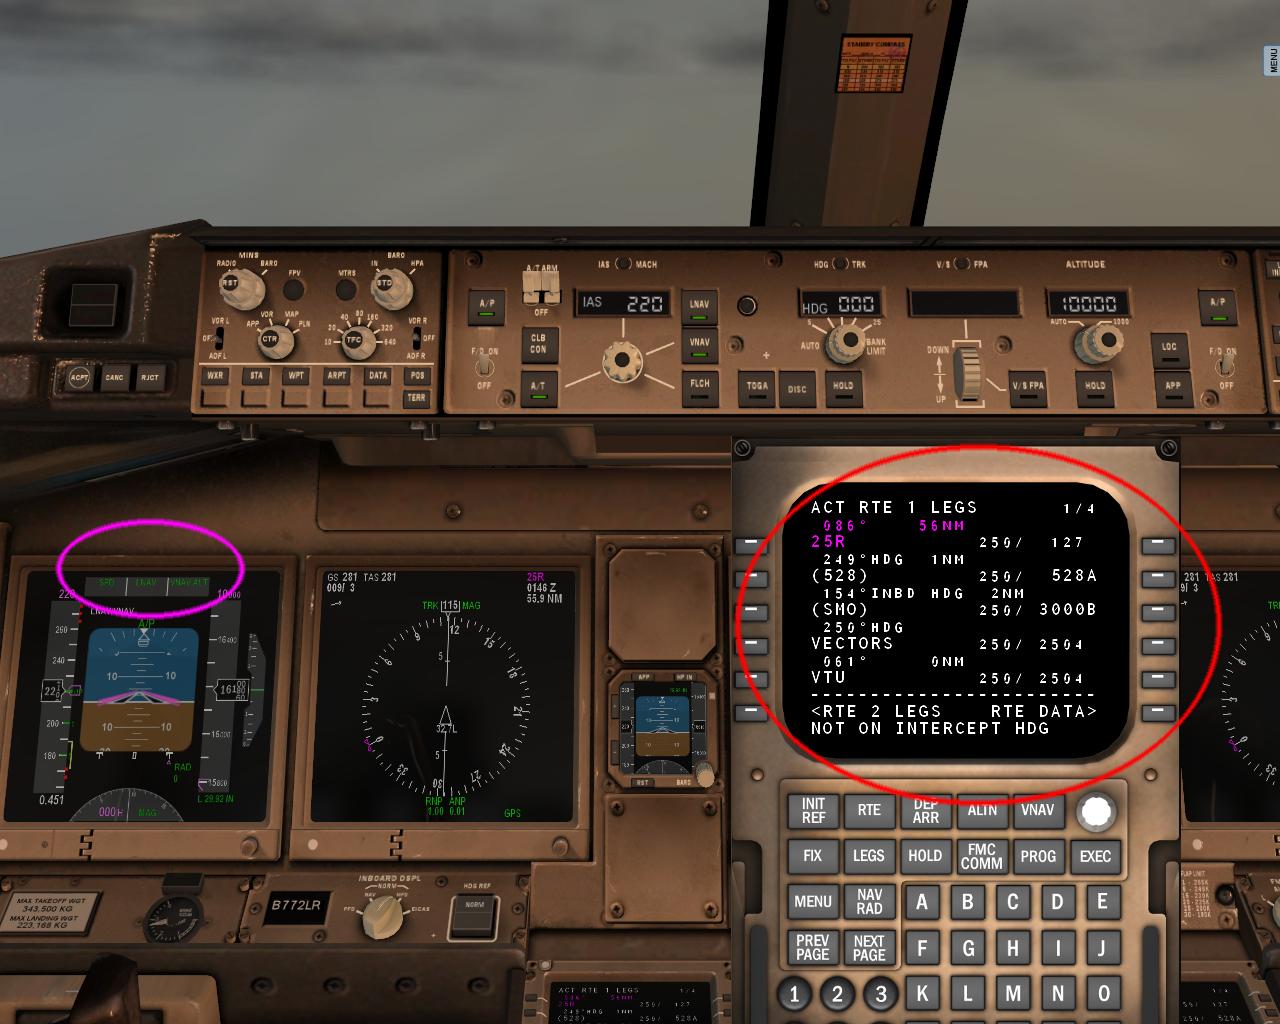 777-200LR_1.jpg